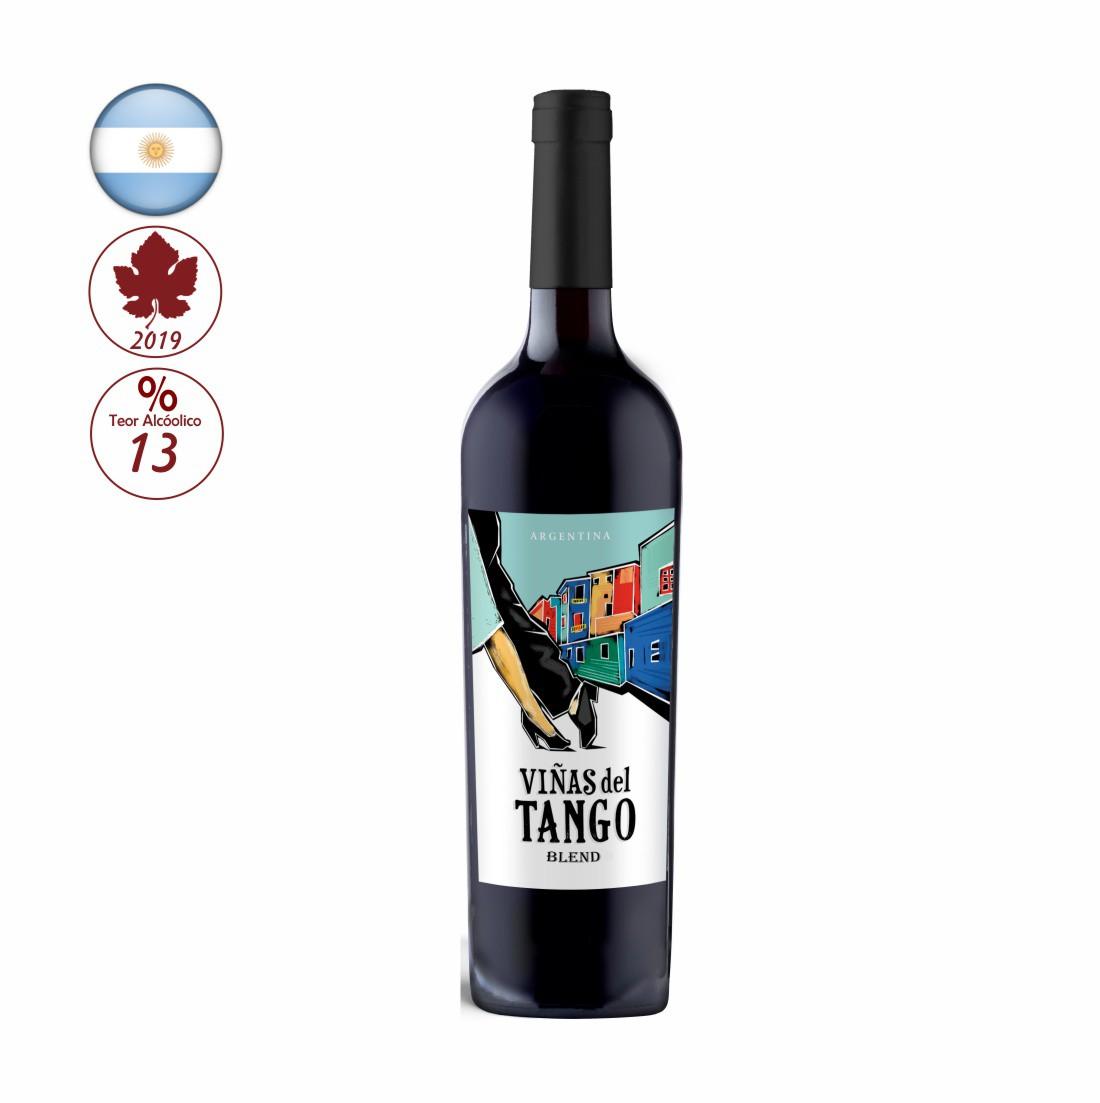 VINHO VIAS DEL TANGO 750ML BLEND